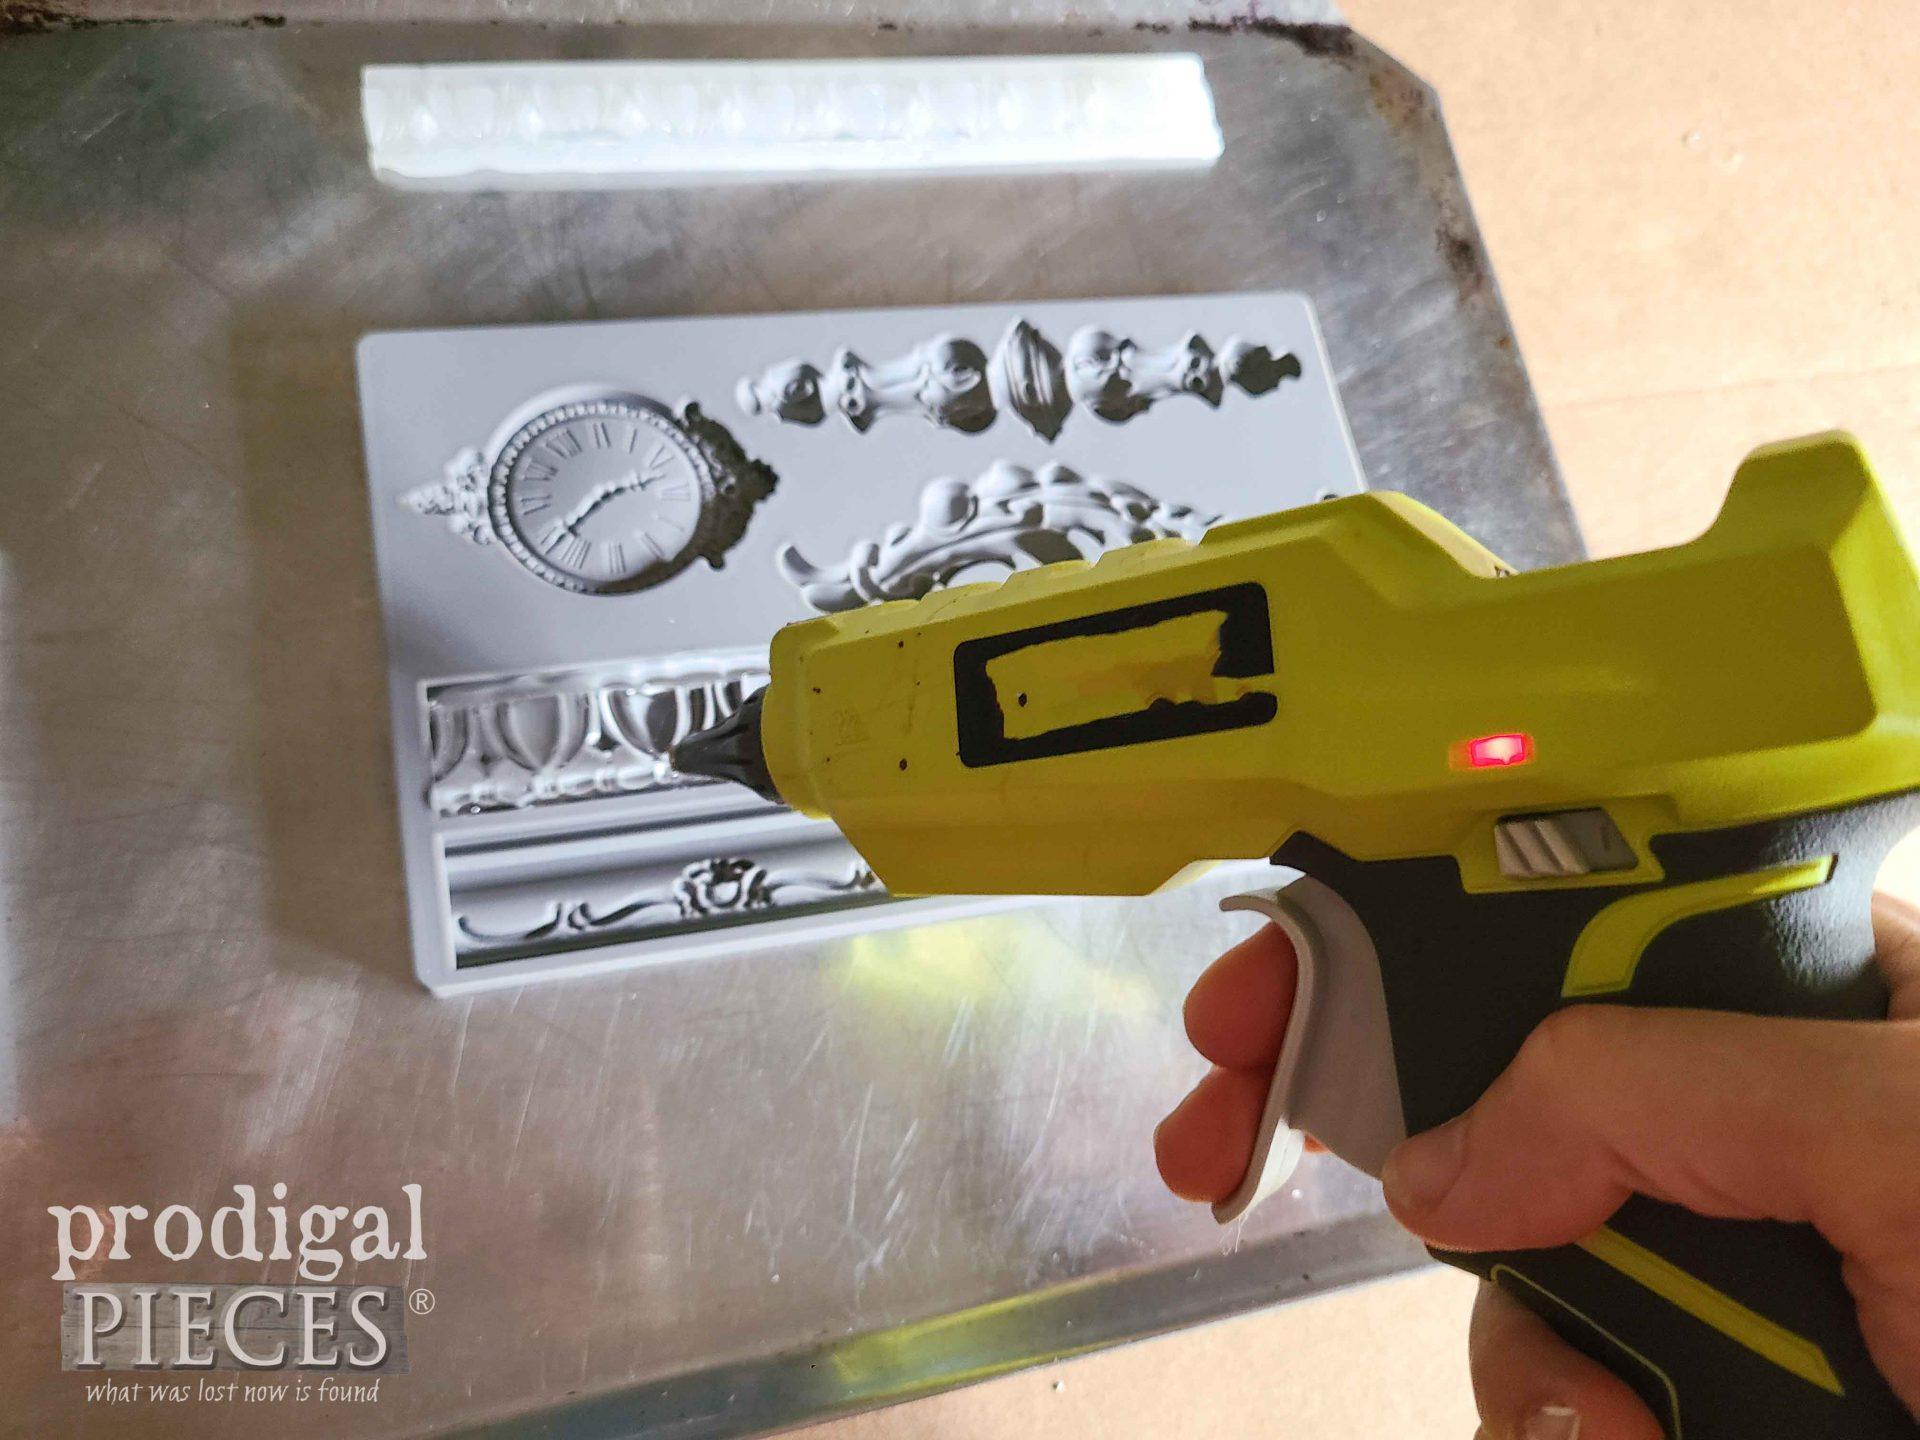 Making Molding with Hot Glue | prodigalpieces.com